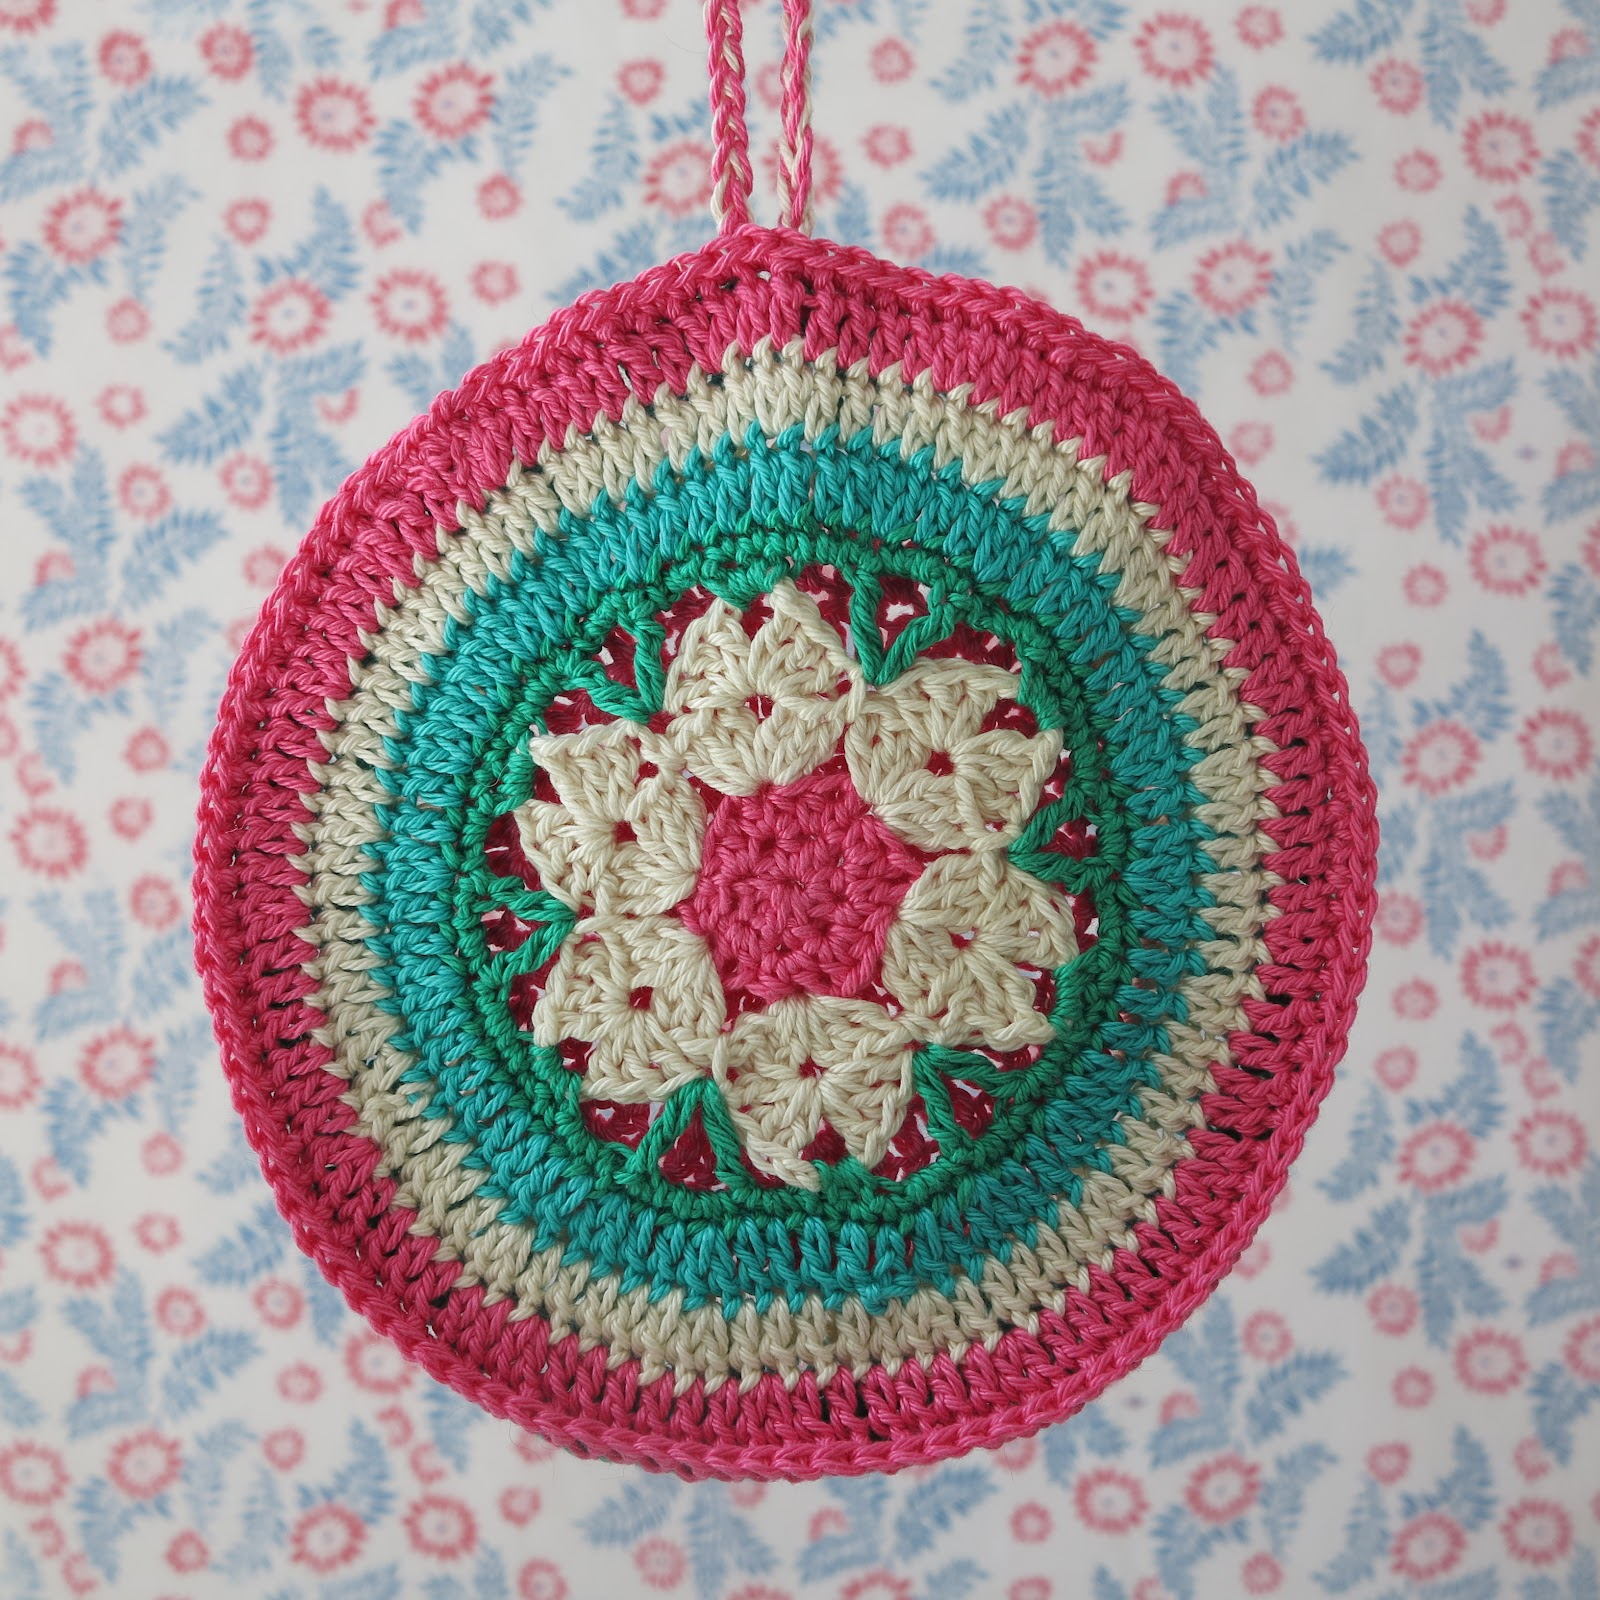 Crochet Potholder : crochet, potholder, Haafner, granny chic, handmade, pastel wallpaper ...